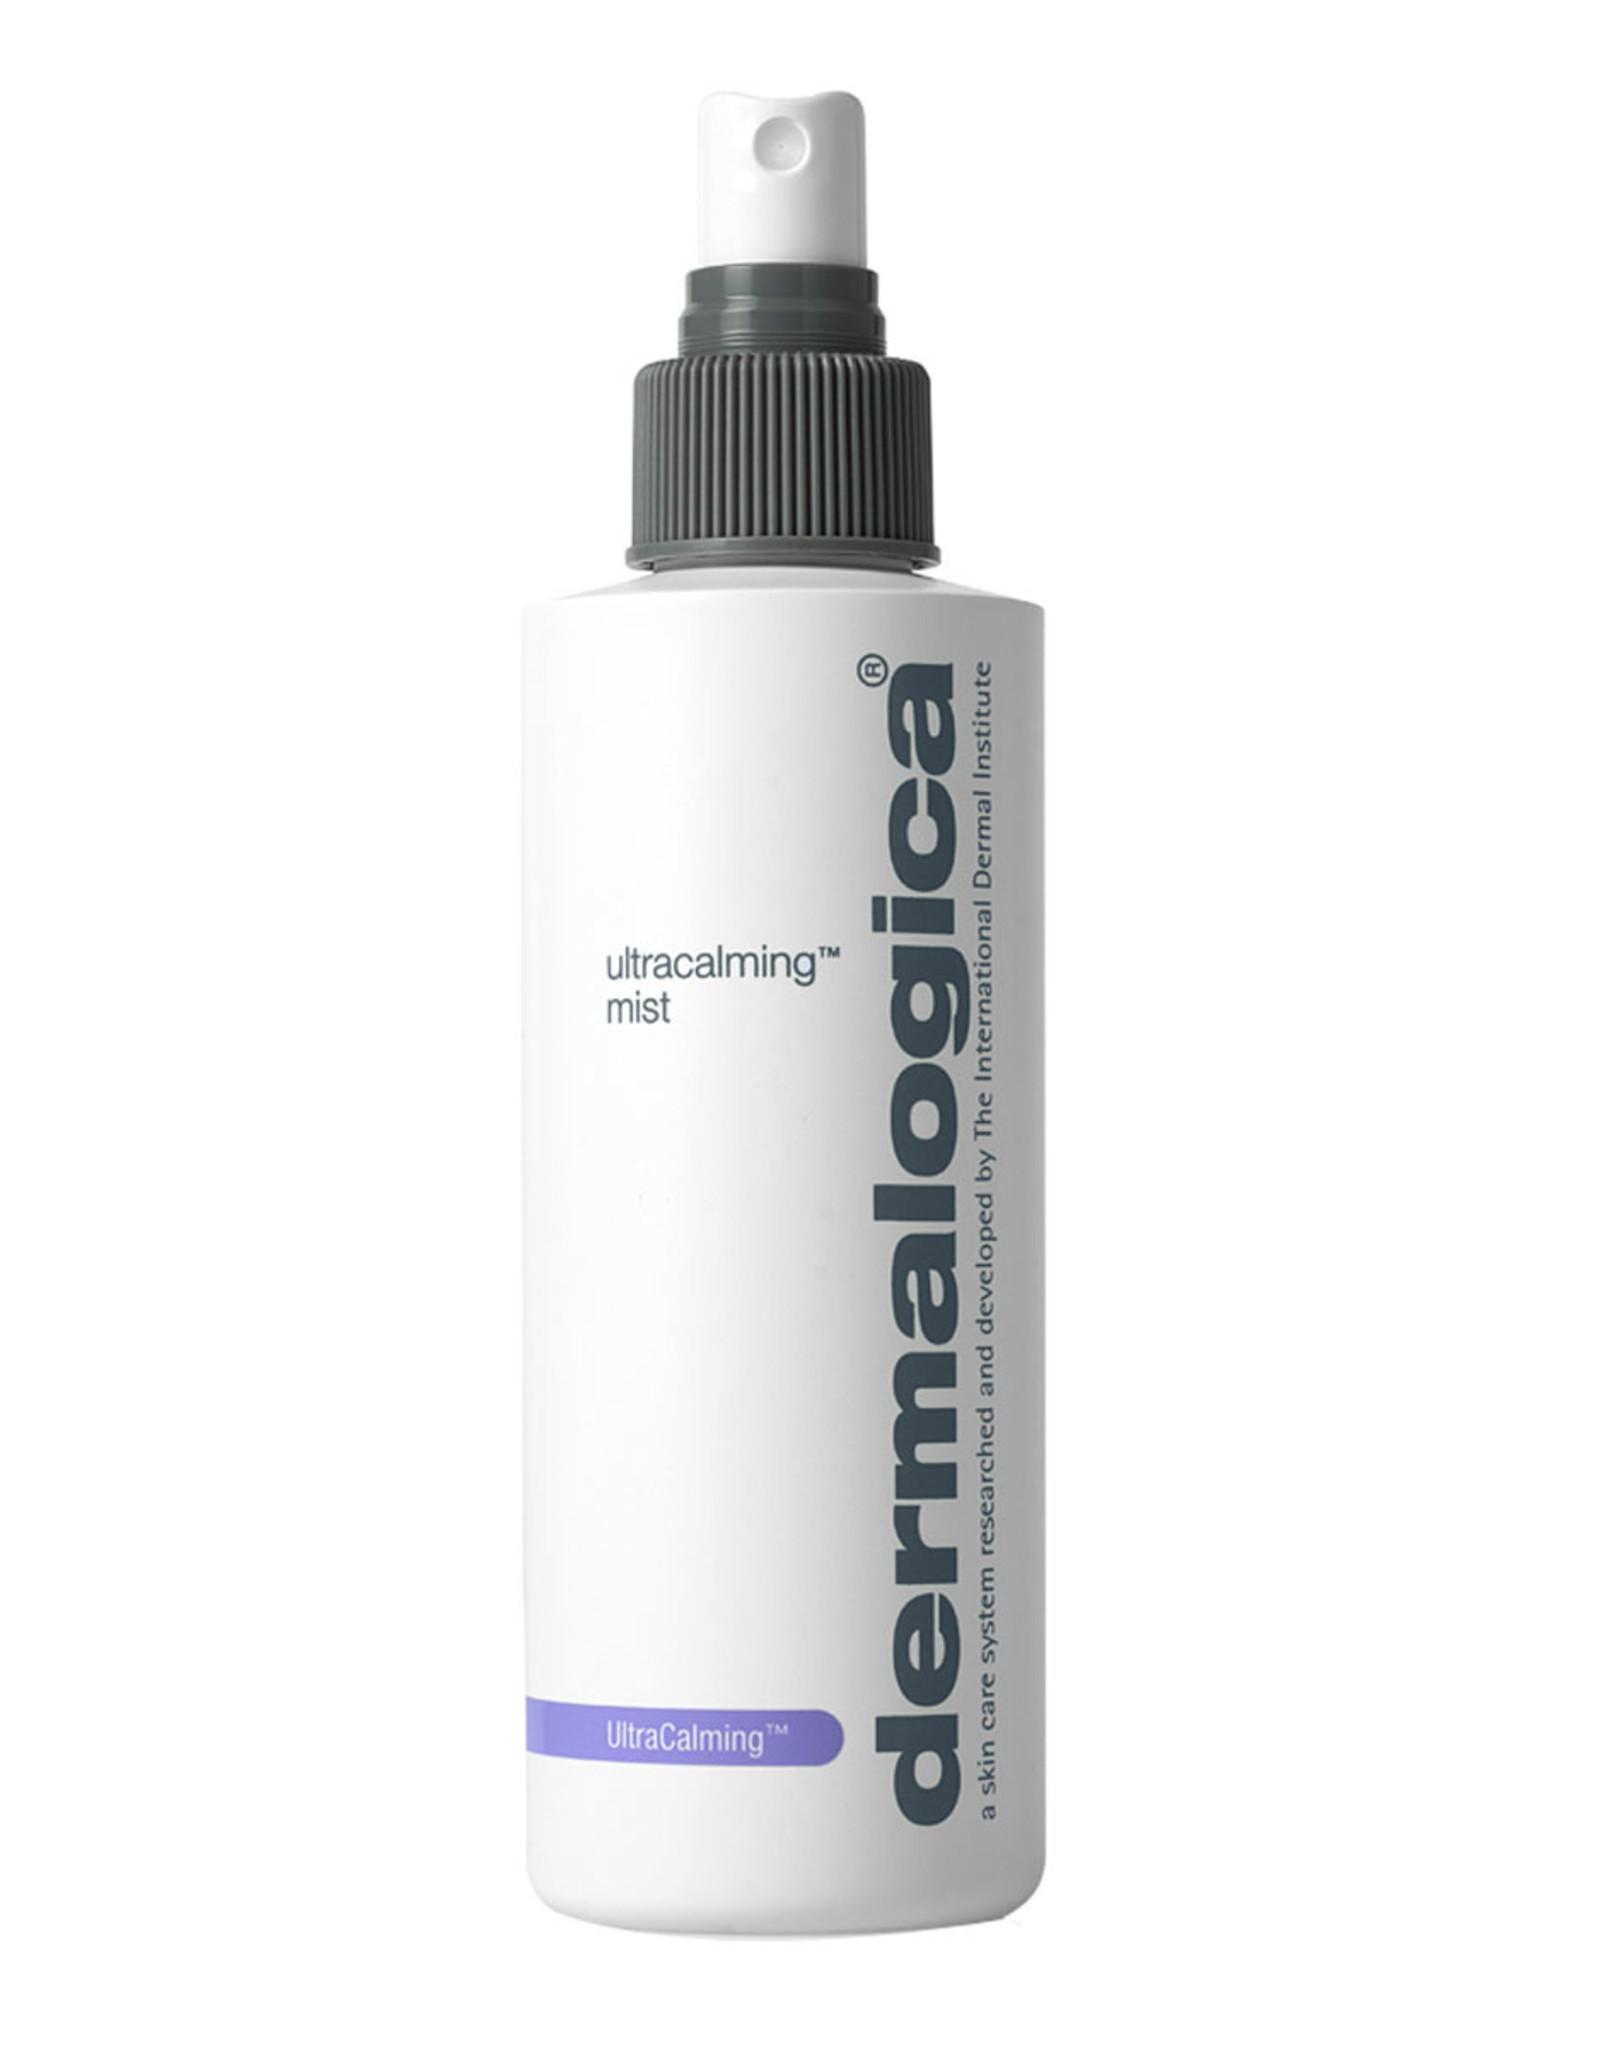 Dermalogica UltraCalming - Mist 177ml - Dermalogica